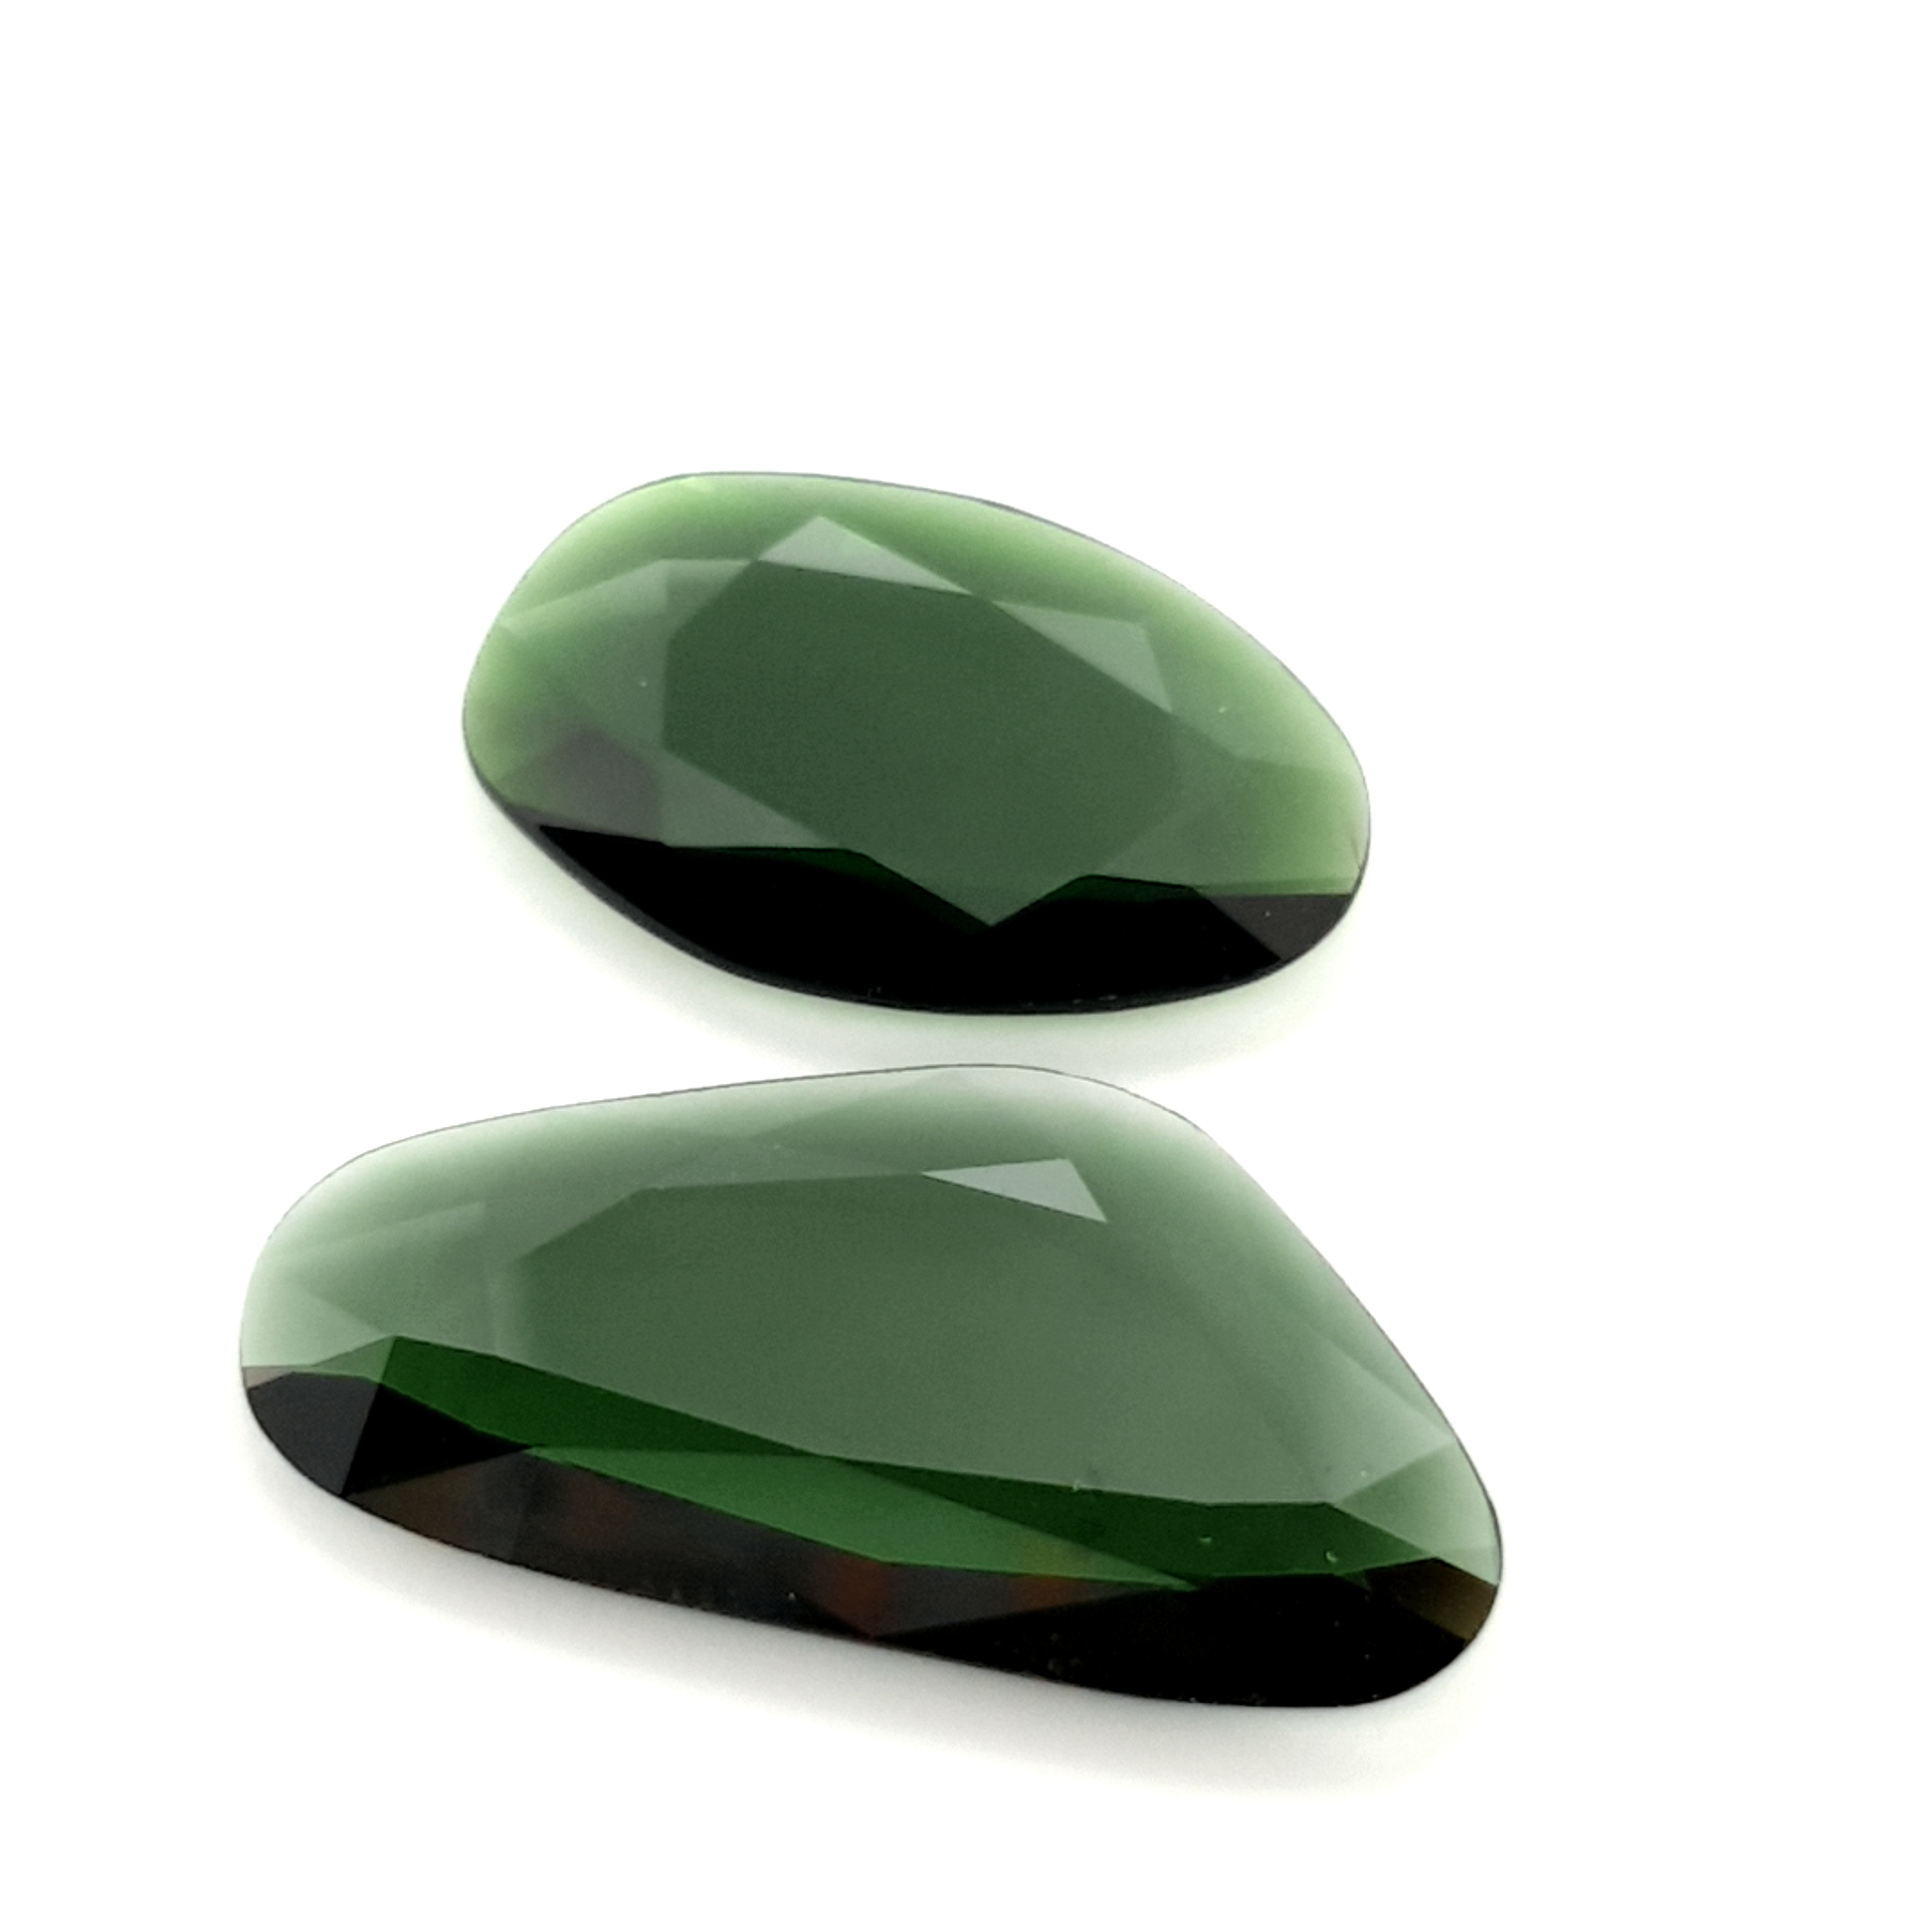 12,42ct.2pc Imperial Green Tourmalin DoubleRoseCut TMK16C1 ClaudiaHamann__2021-02-11-15-56-59